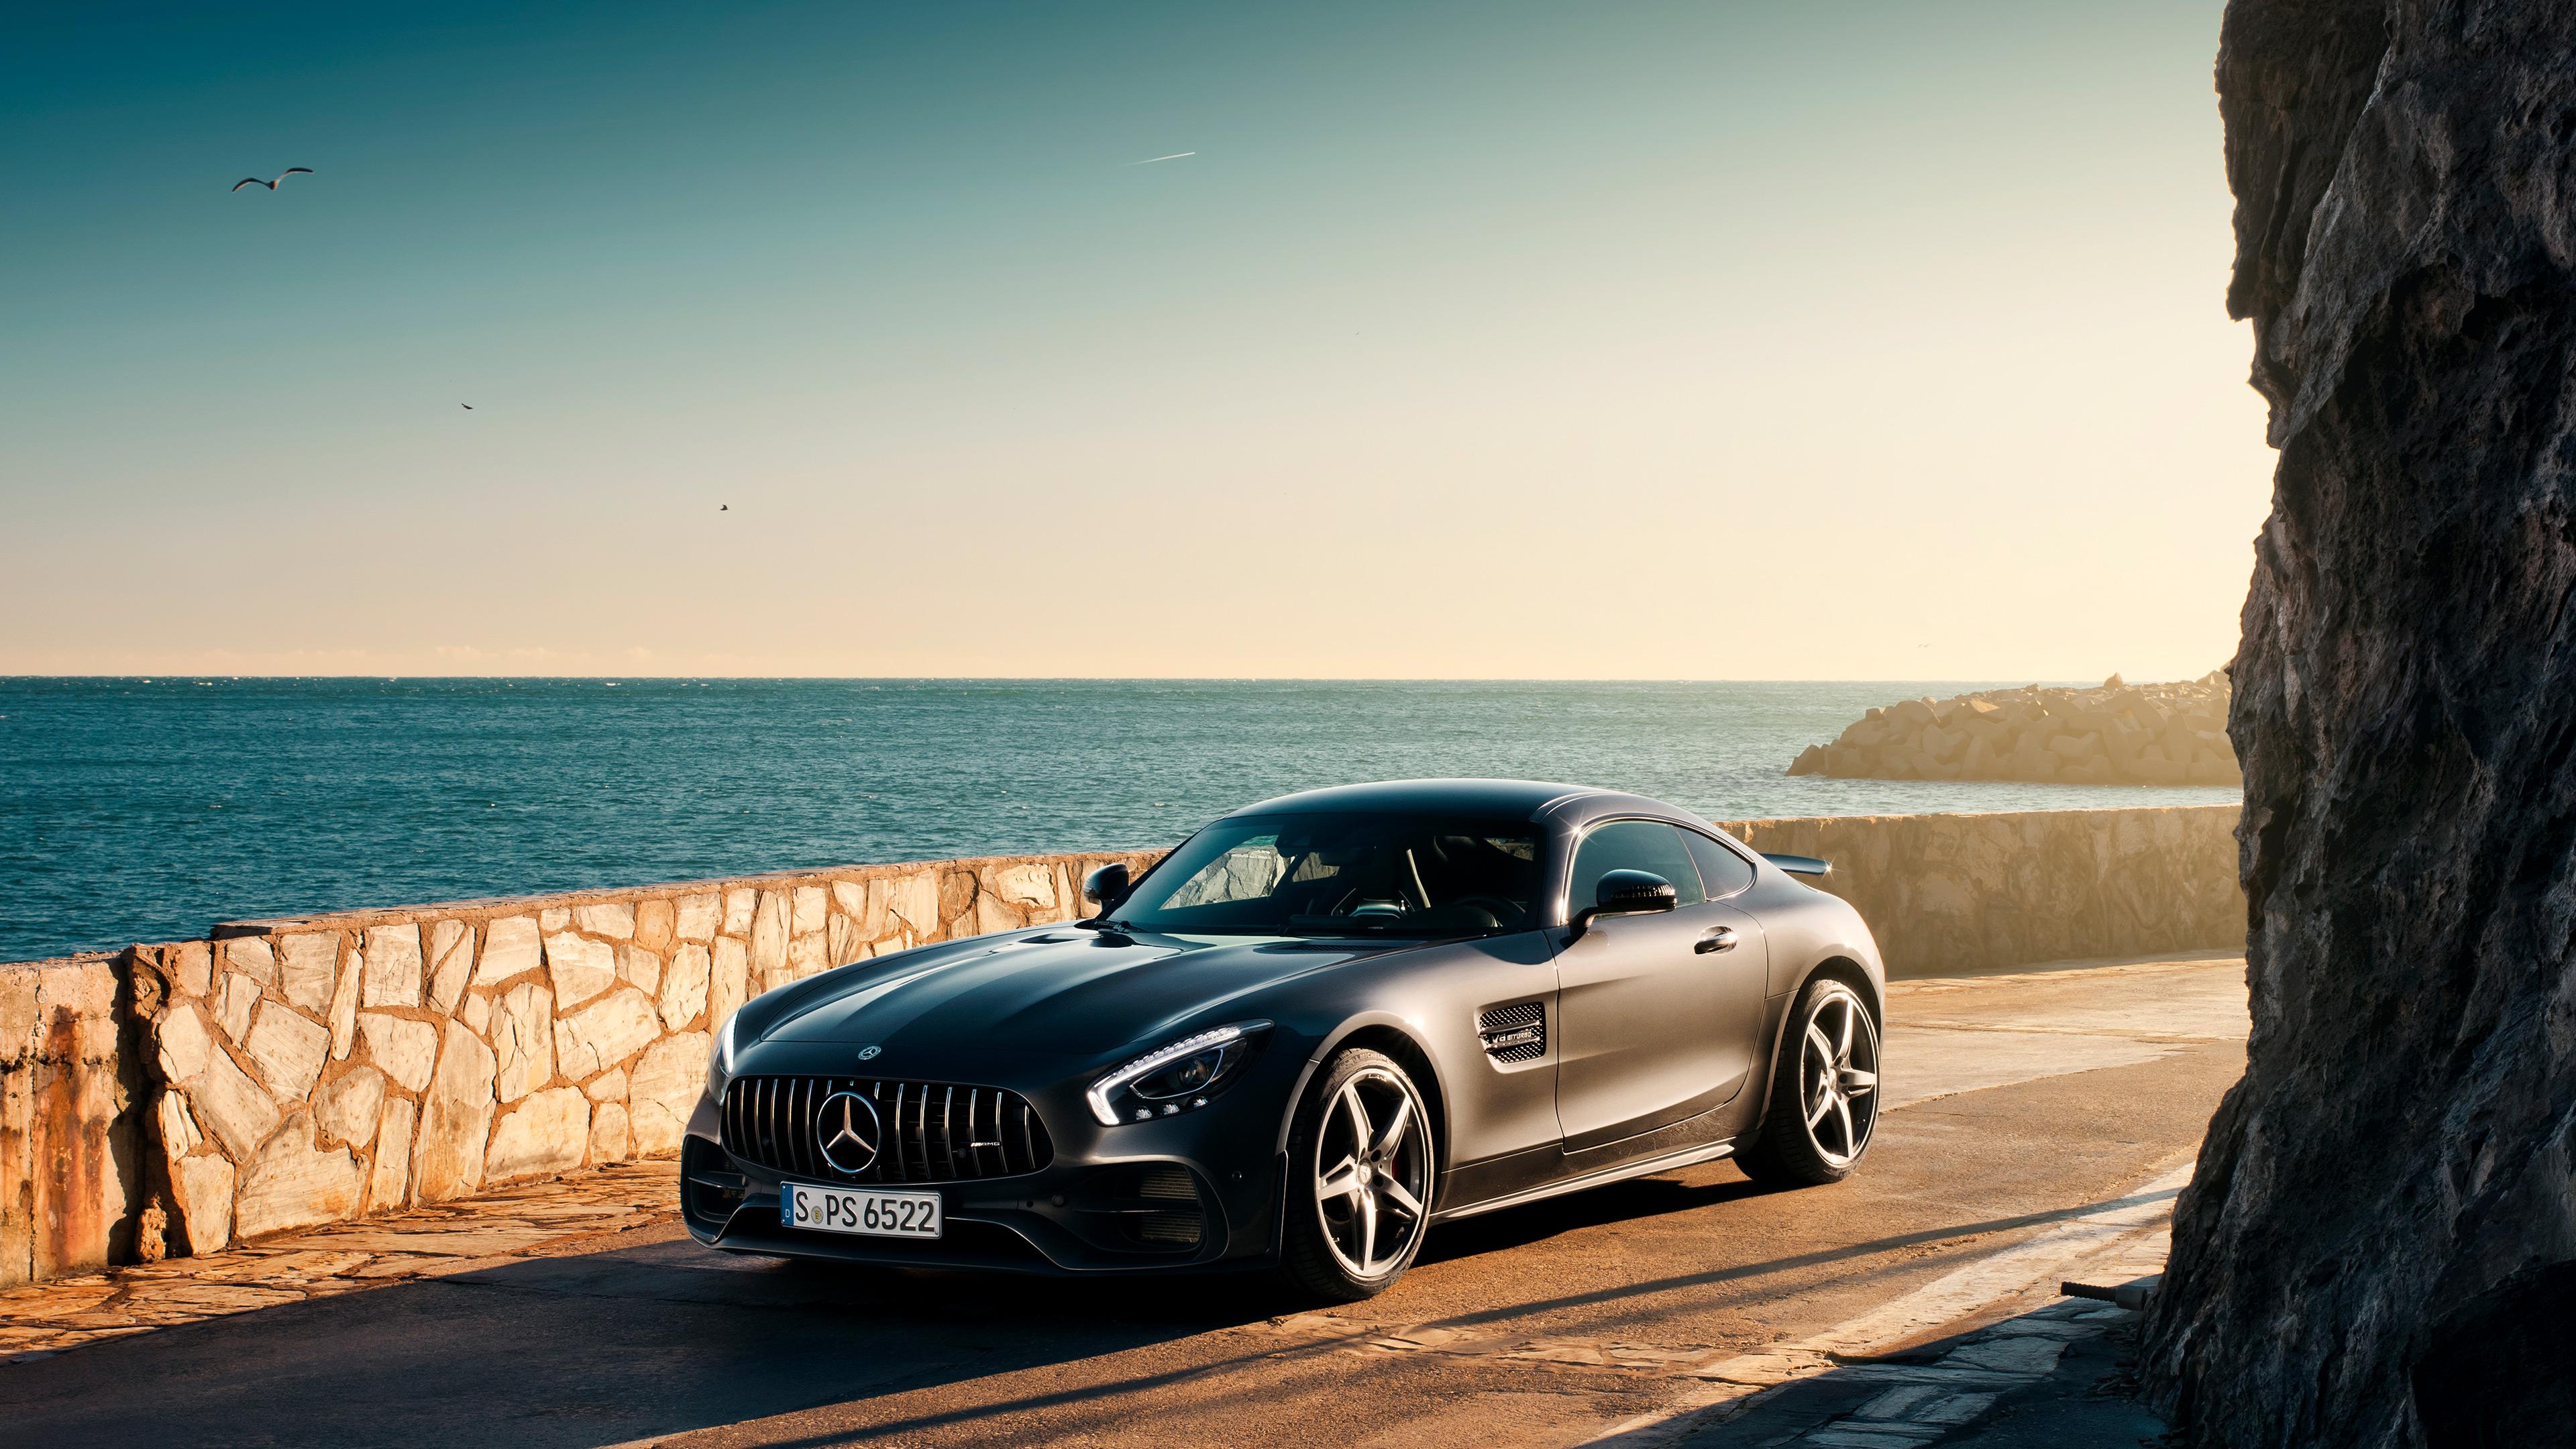 black mercedes benz amg gt 4k 1547937415 - Black Mercedes Benz Amg GT 4k - mercedes wallpapers, mercedes amg gt wallpapers, hd-wallpapers, cars wallpapers, 4k-wallpapers, 2019 cars wallpapers